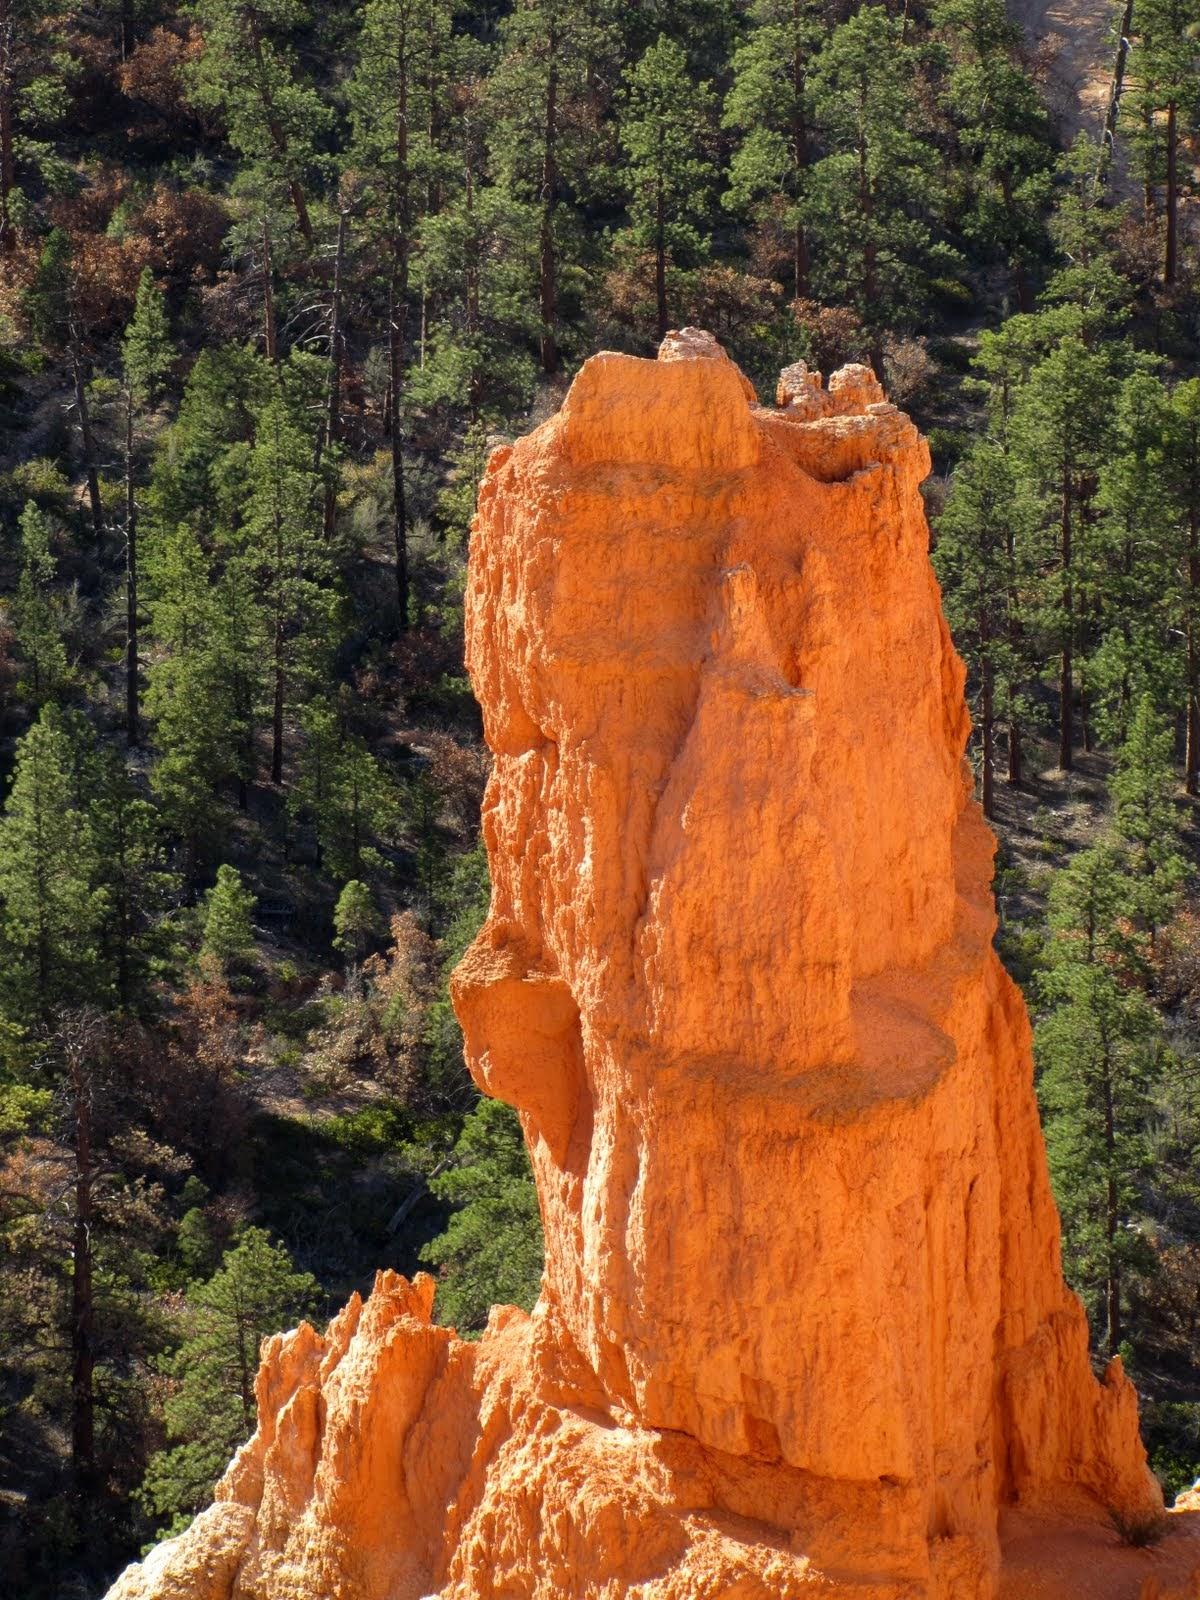 The Orange Tower